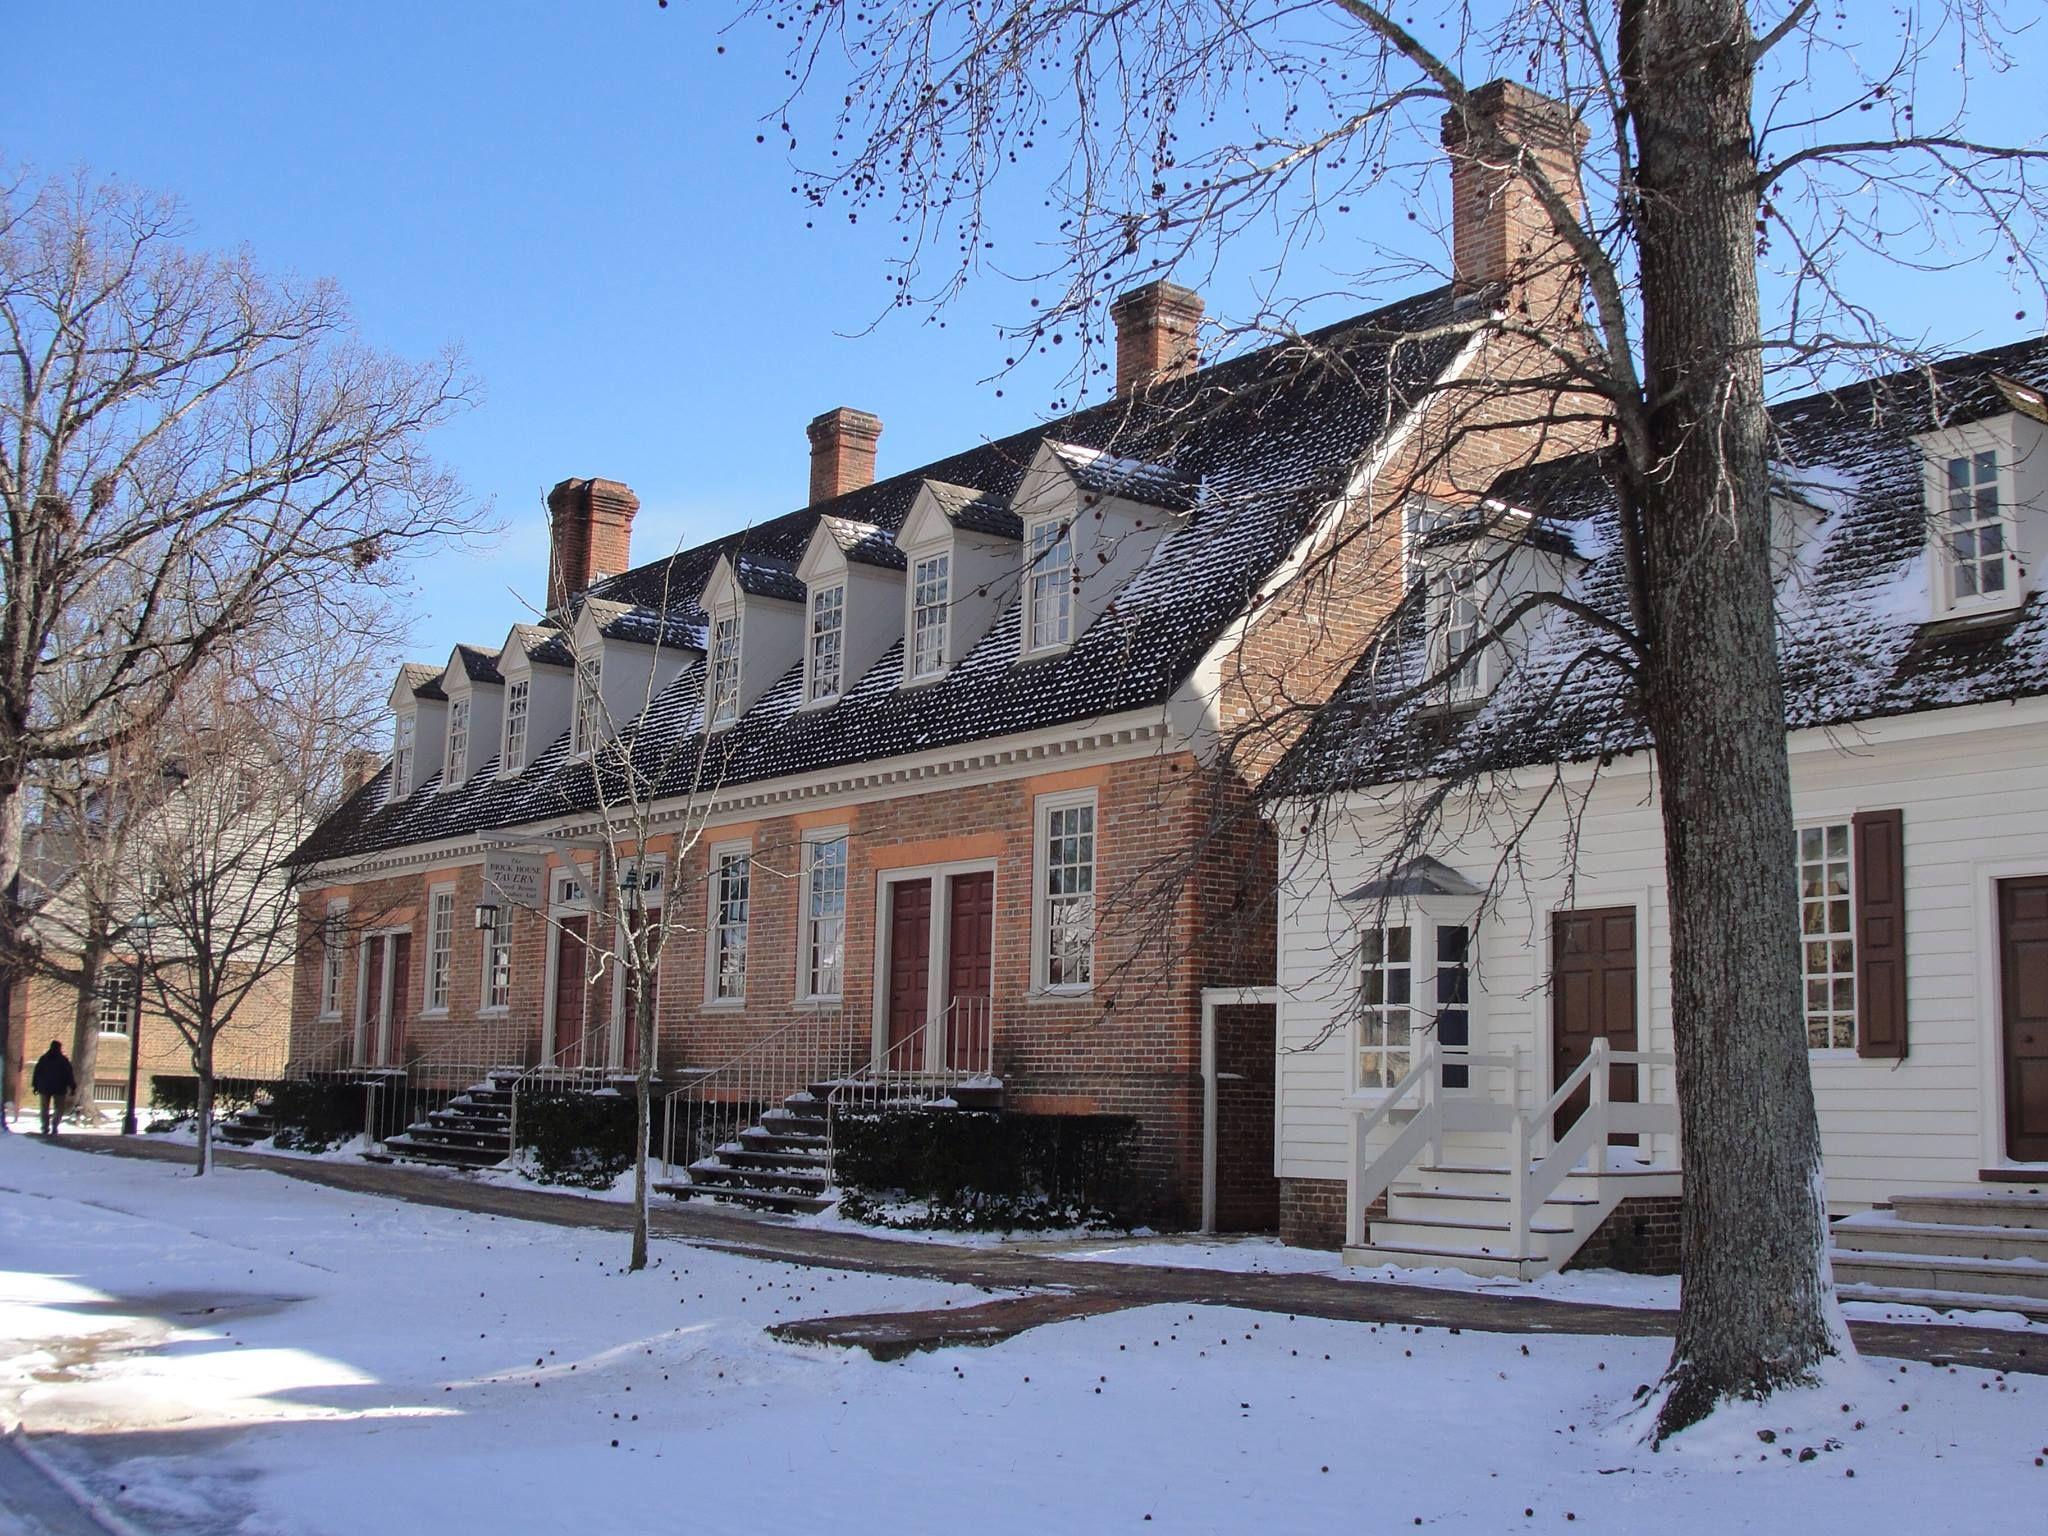 Capitol Building - Colonial Williamsburg, VA